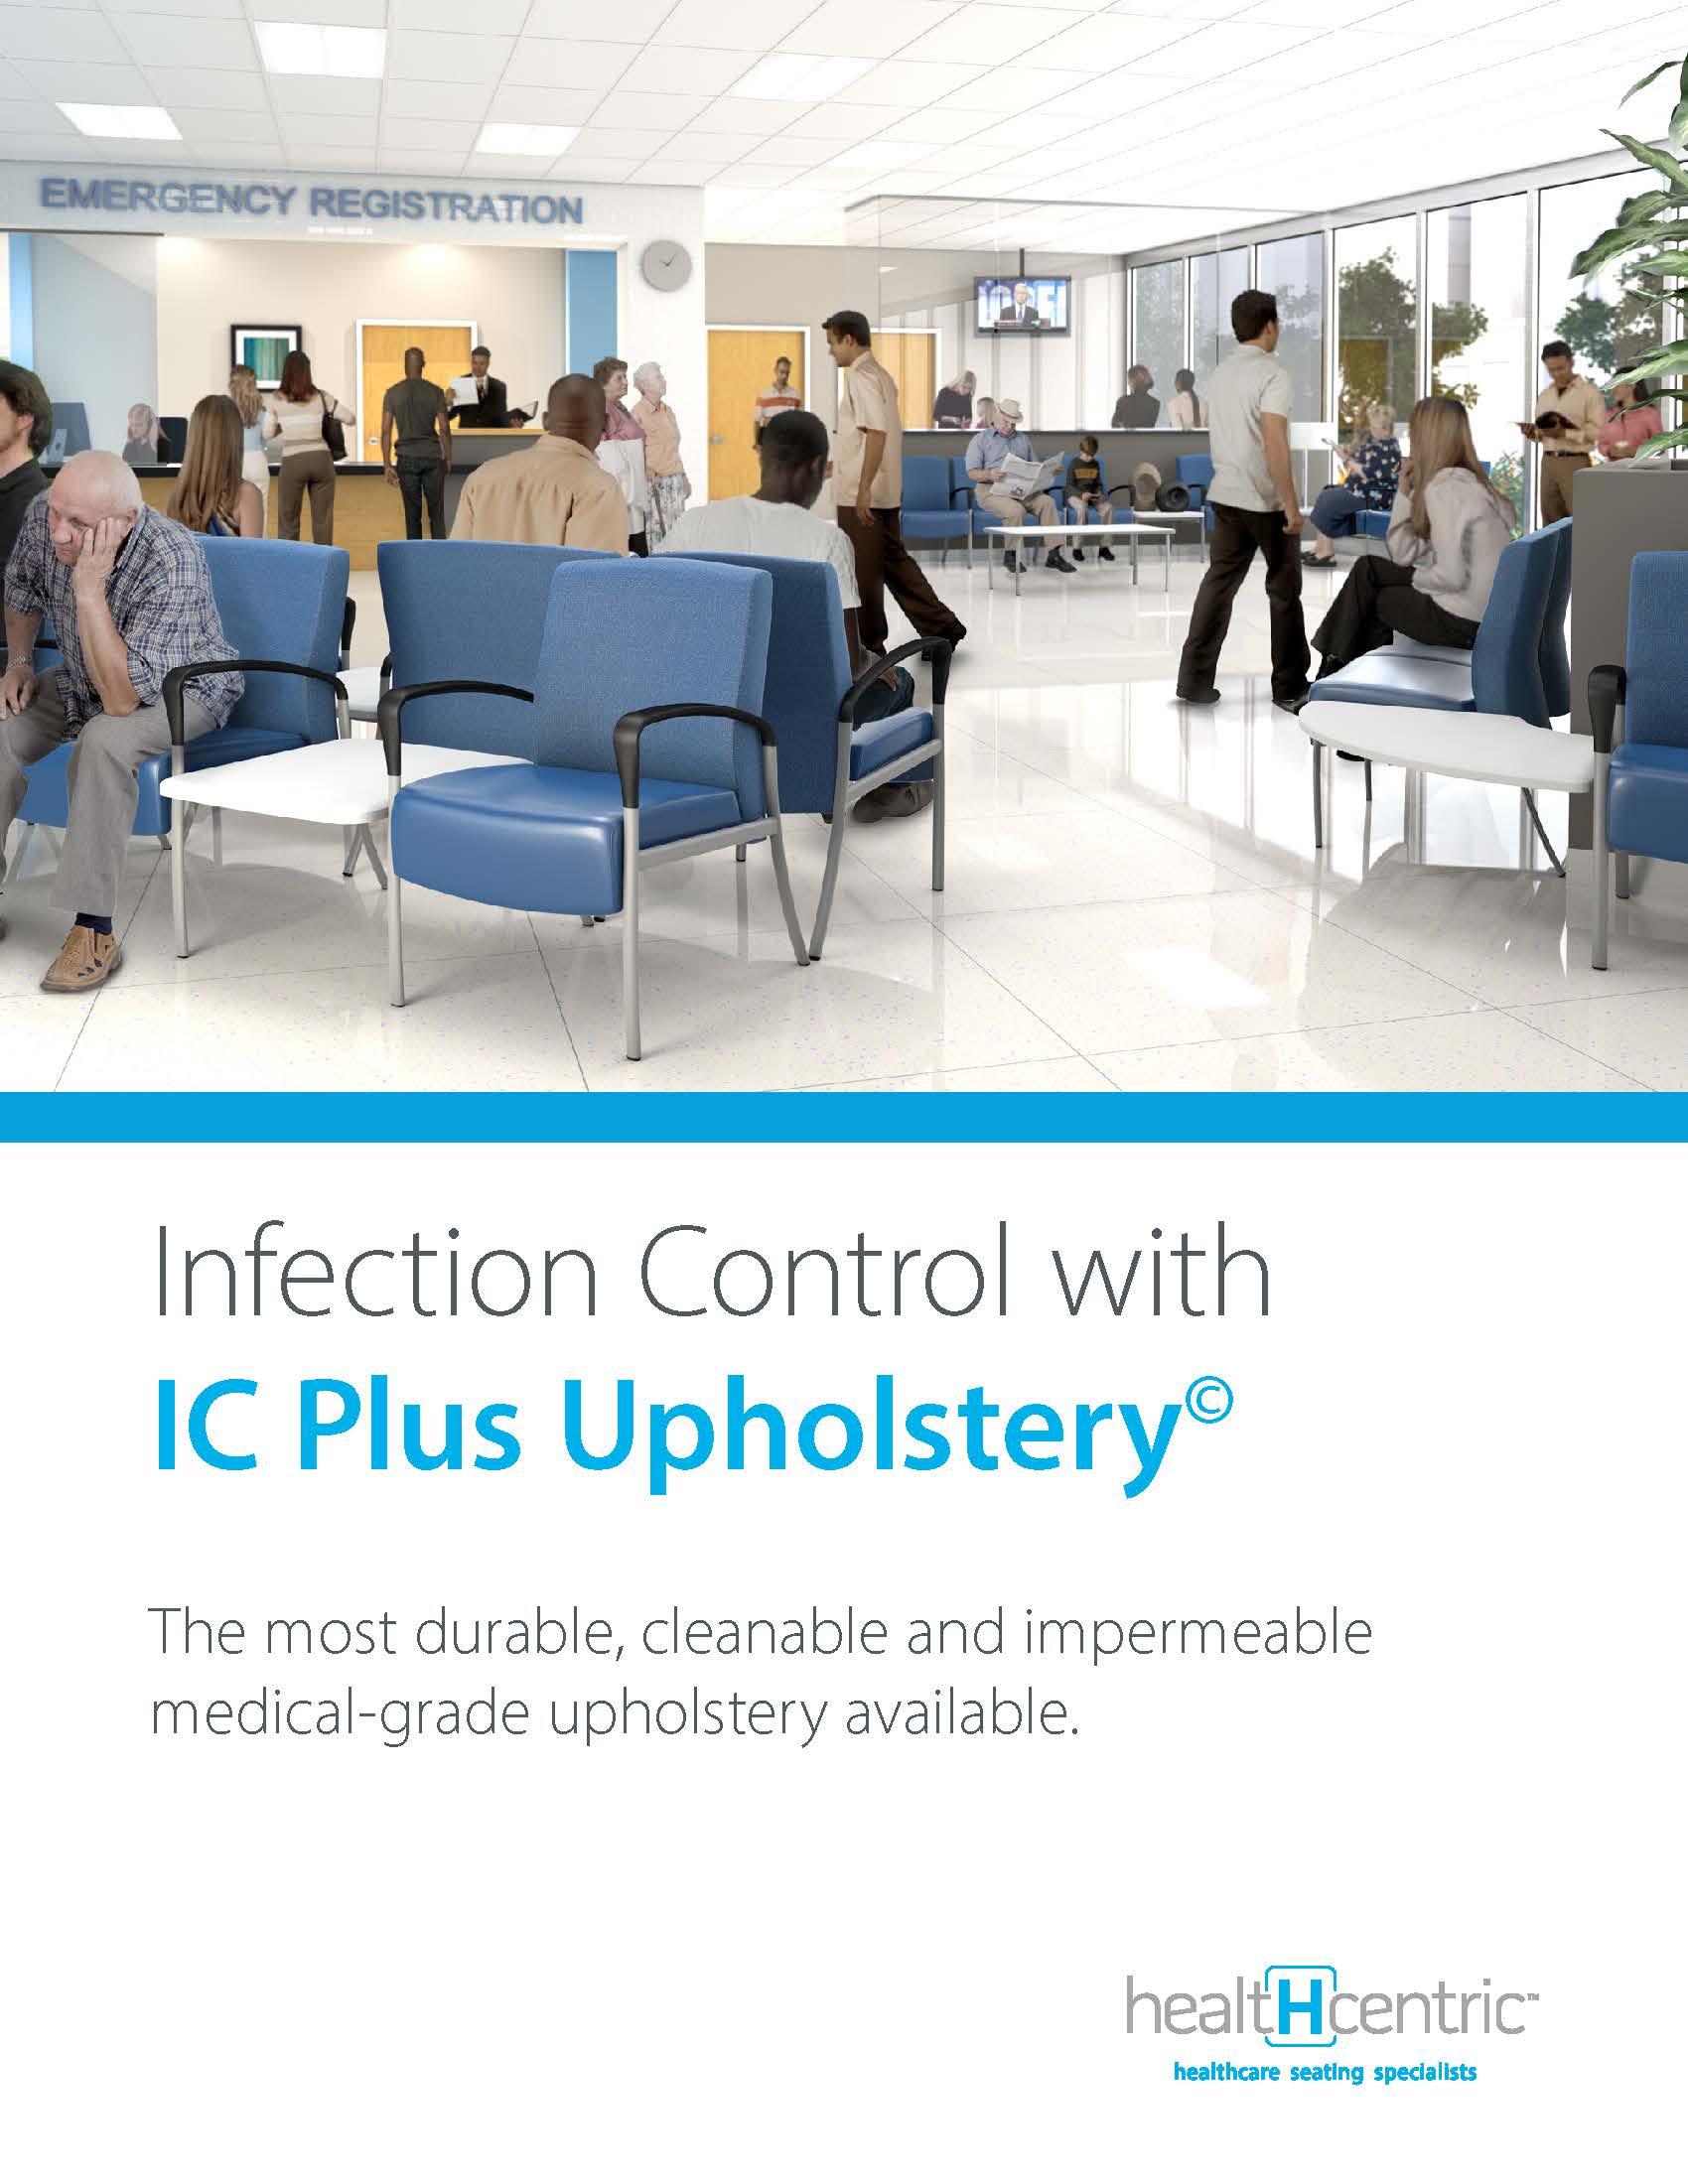 IC Plus Upholstery